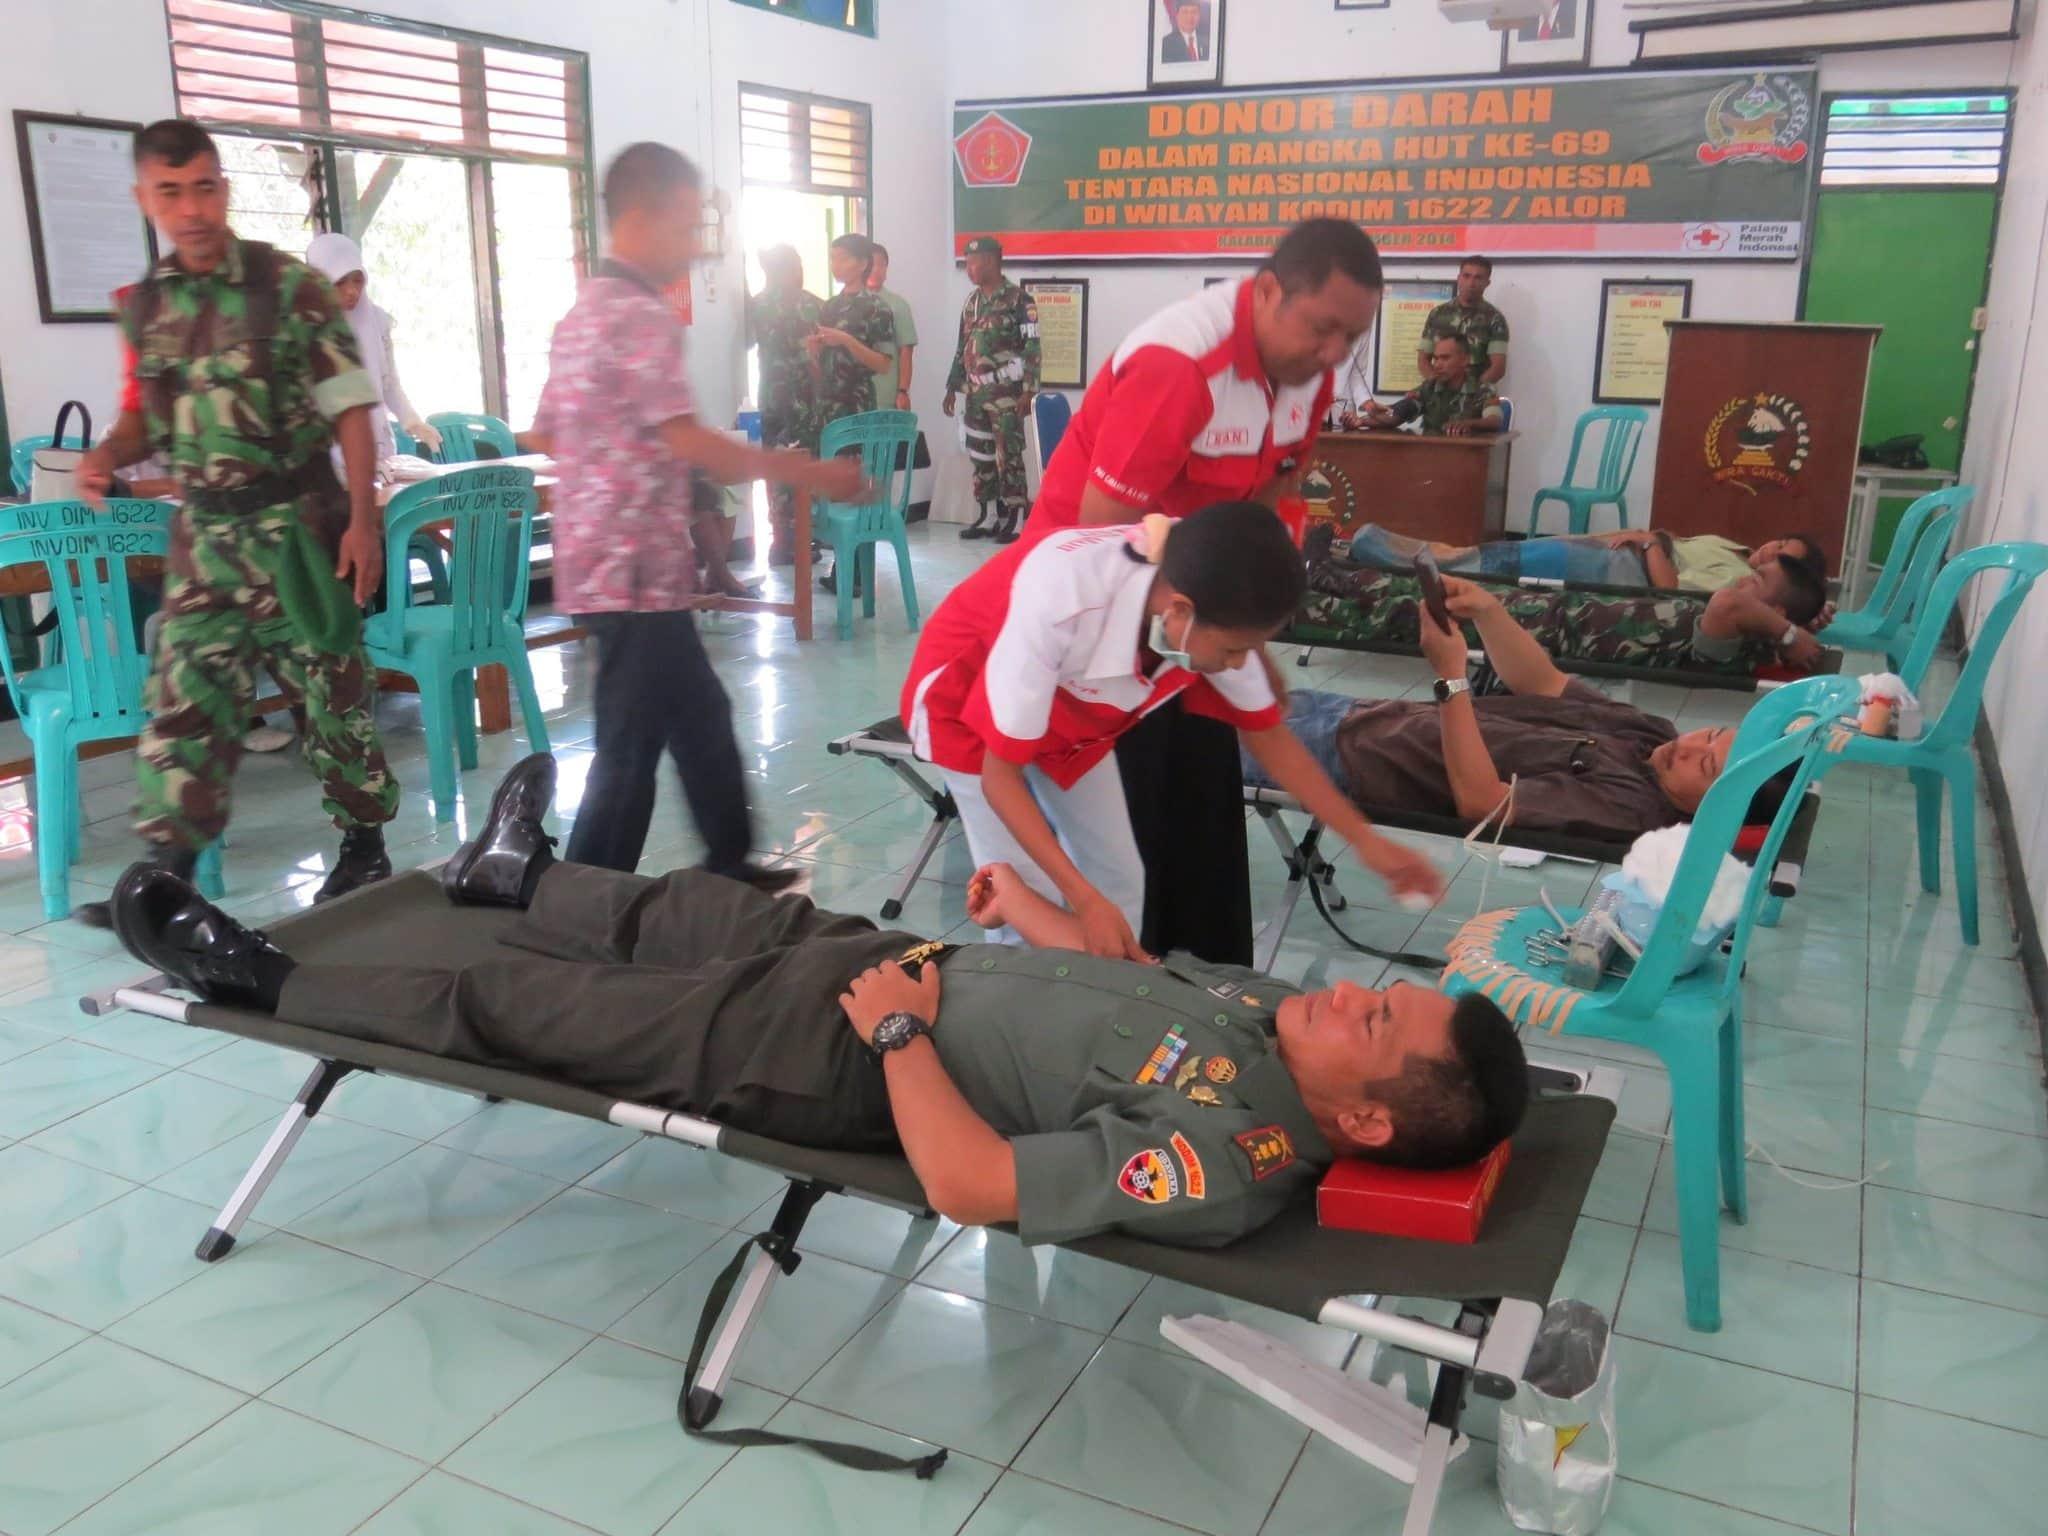 KODIM 1622/ALOR DONOR DARAH PERINGATI HUT KE-69 TNI